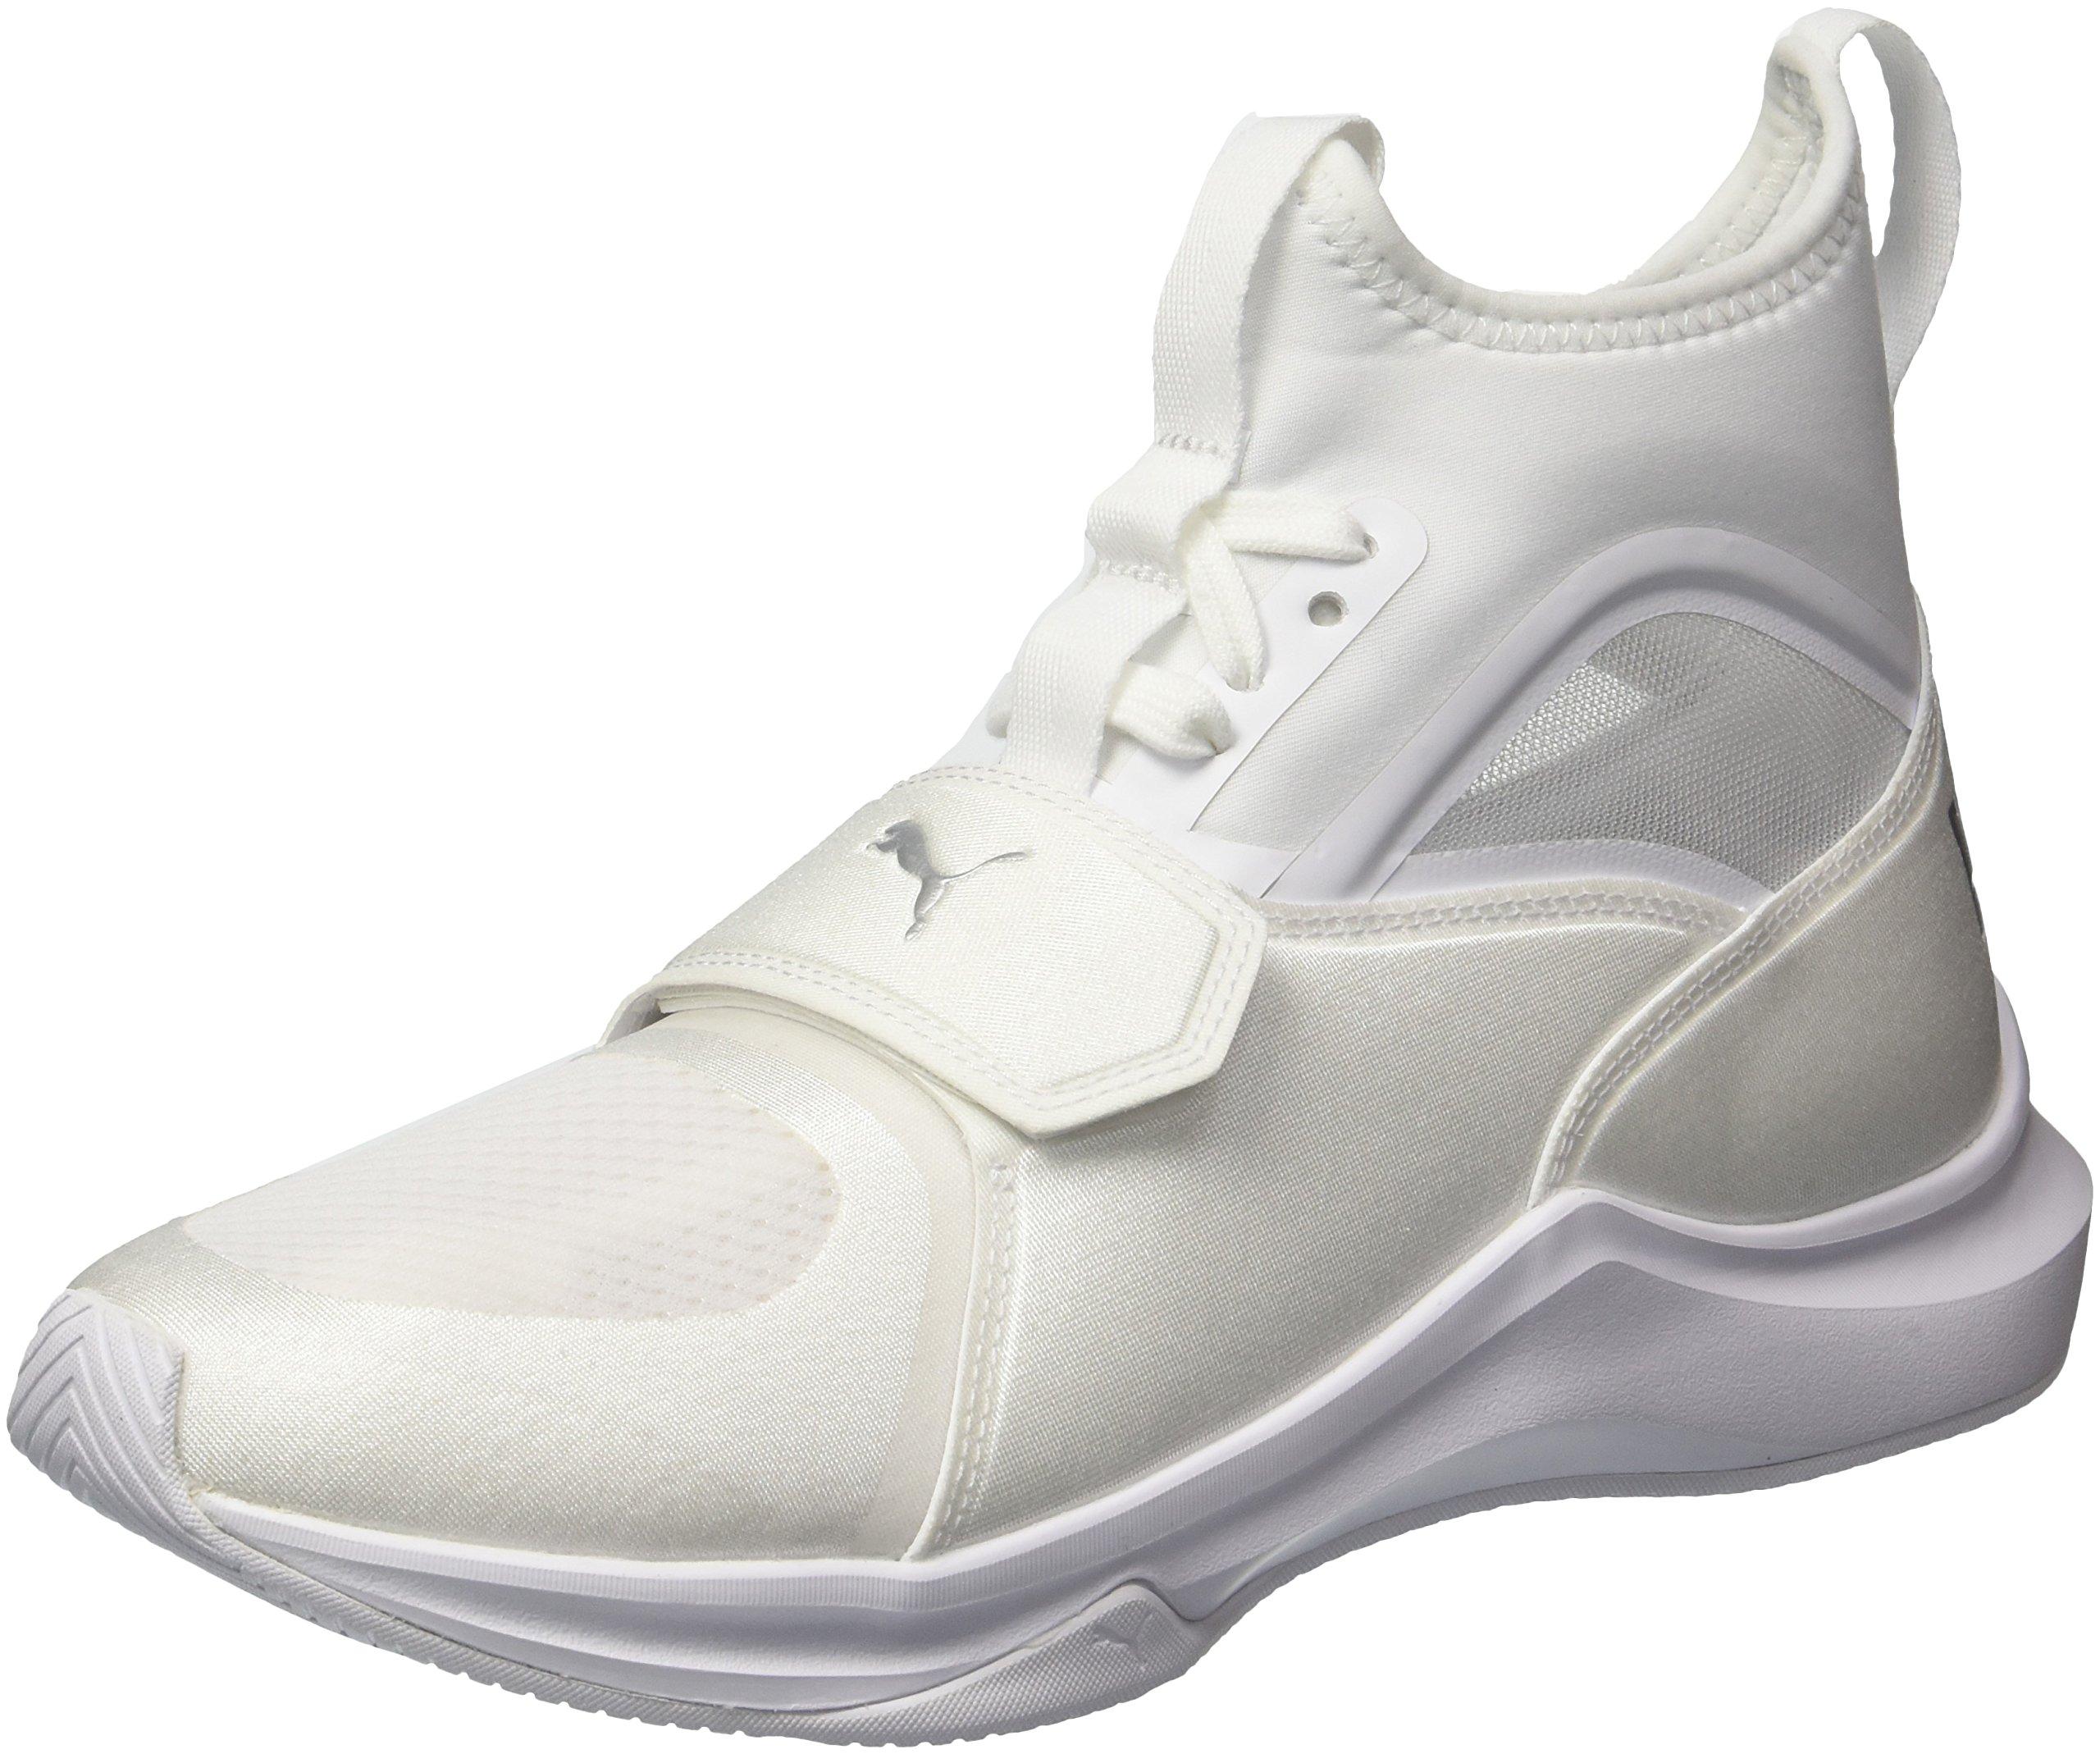 PUMA Women's Phenom Wn Sneaker, White White, 9.5 M US by PUMA